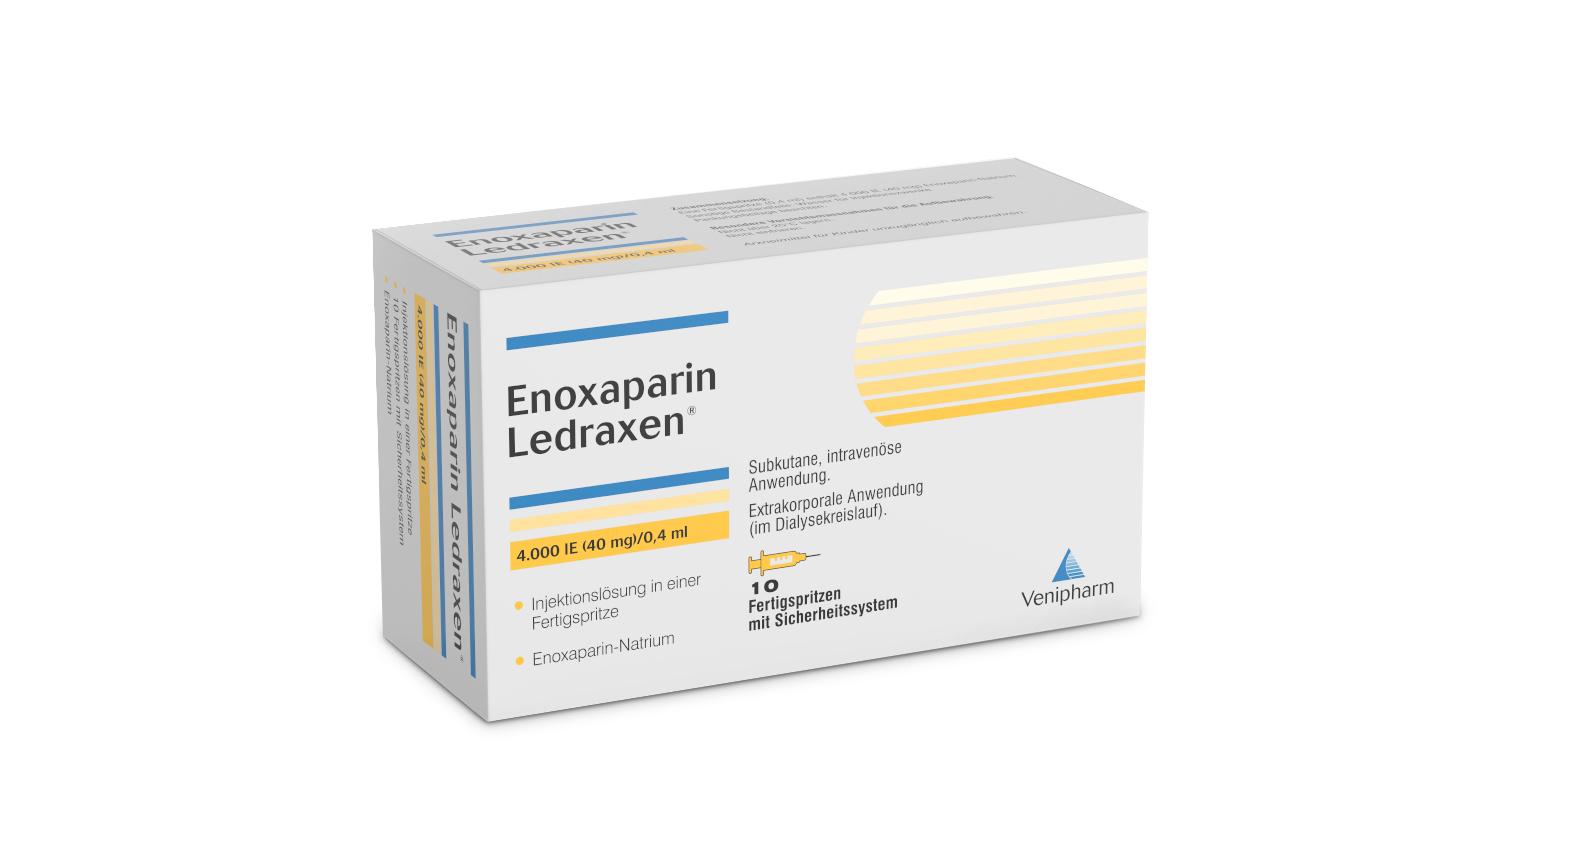 Enoxaparin_Ledraxen_4.000